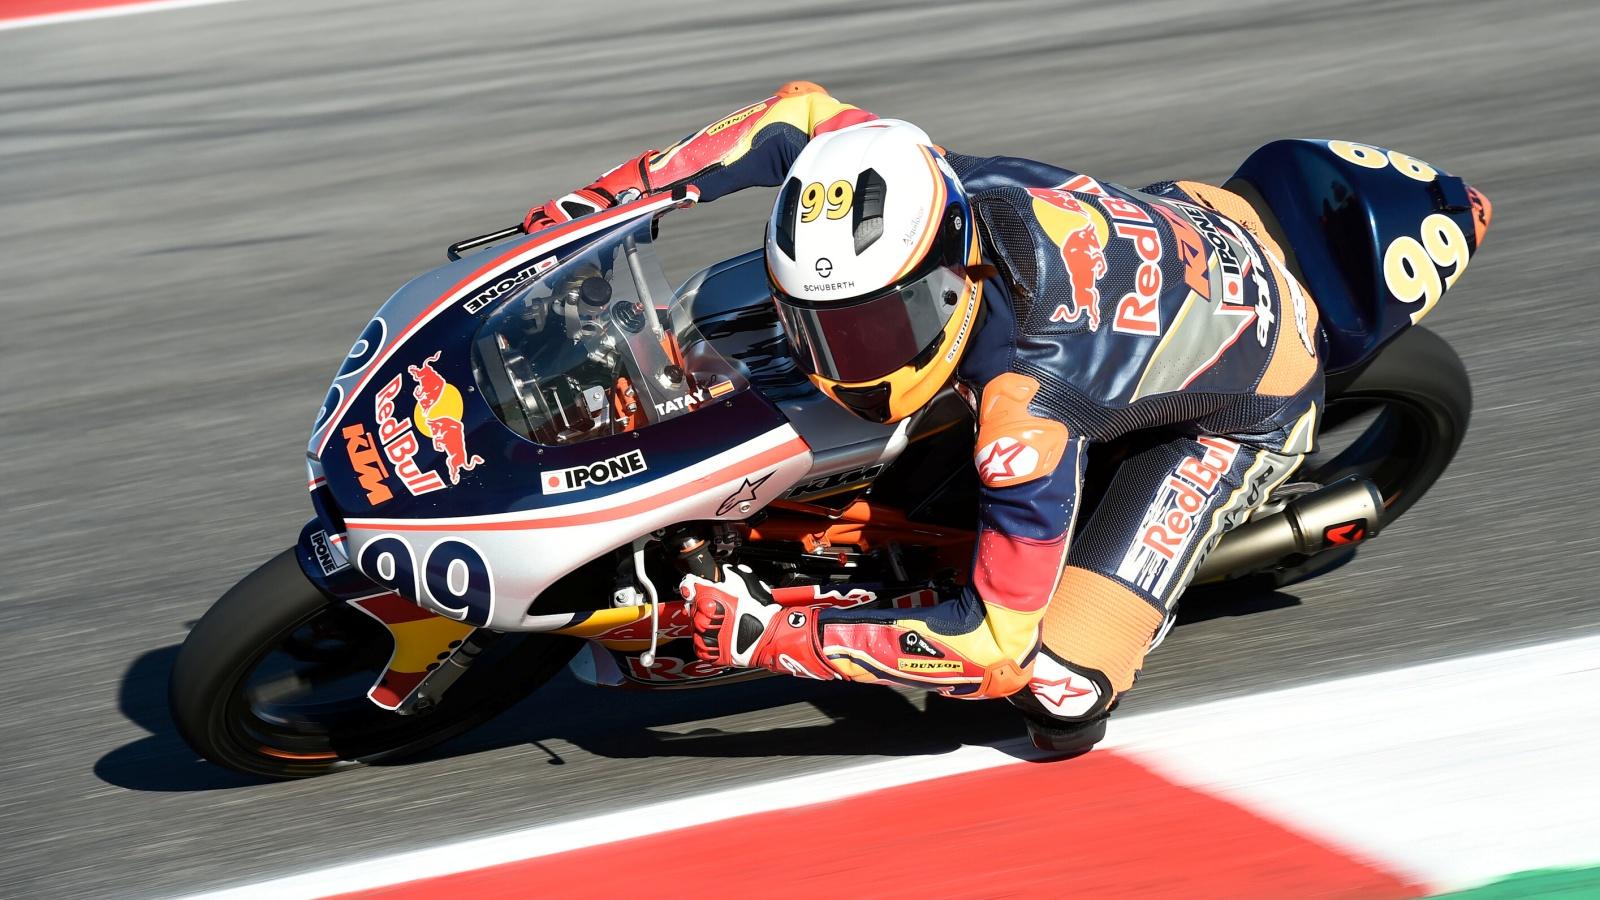 Carlos Tatay conquista la Red Bull MotoGP Rookies Cup 2019